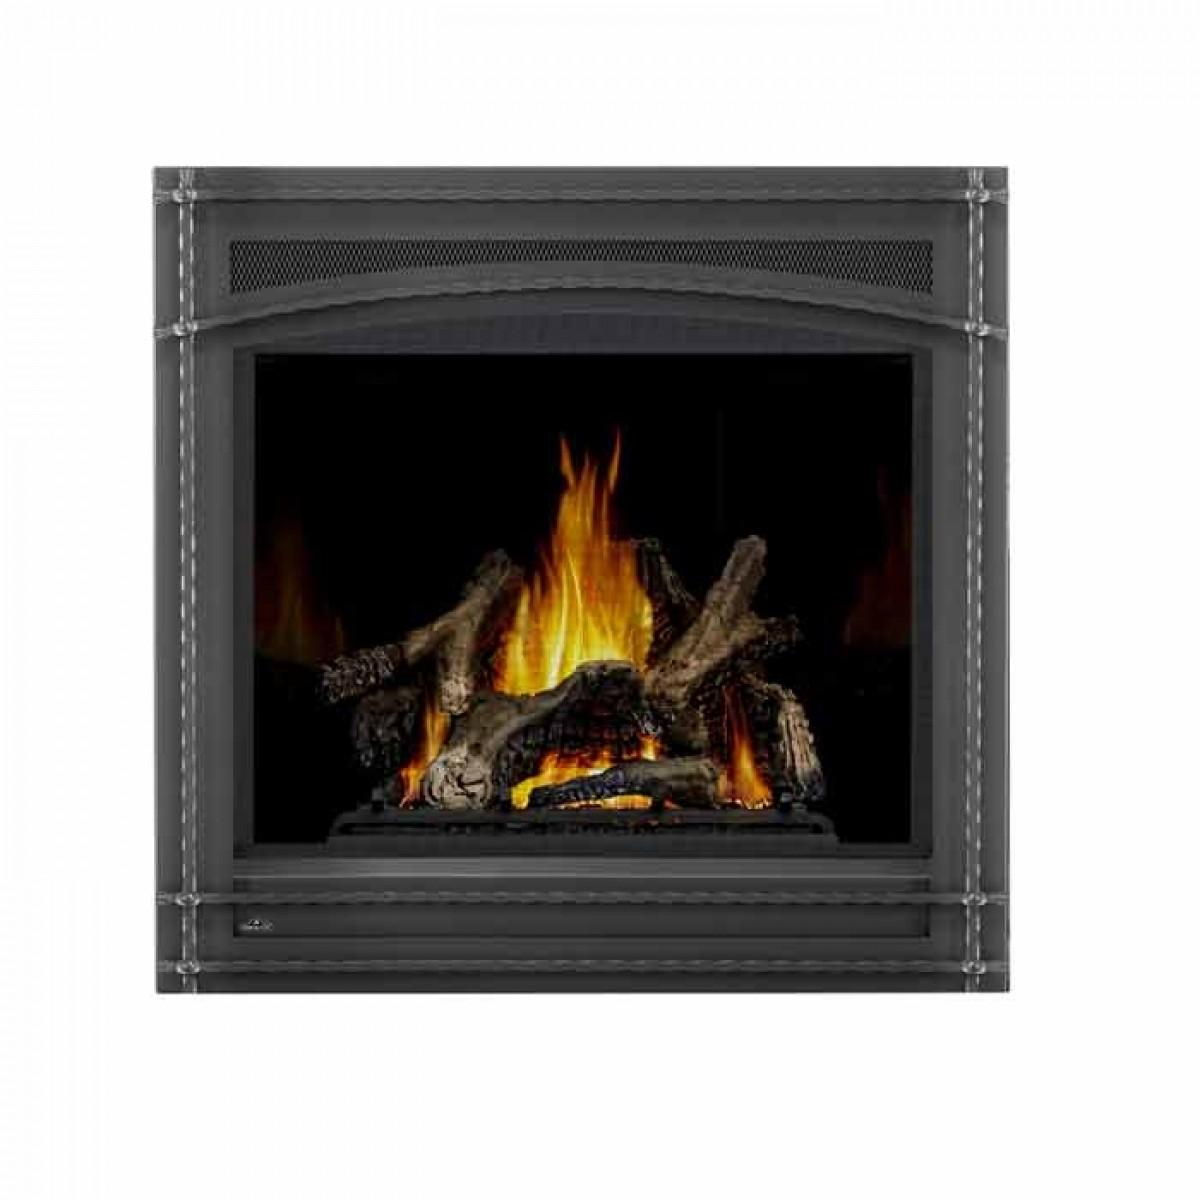 Napoleon GX70PTE Ascent X 70 DV LP Propane Fireplace